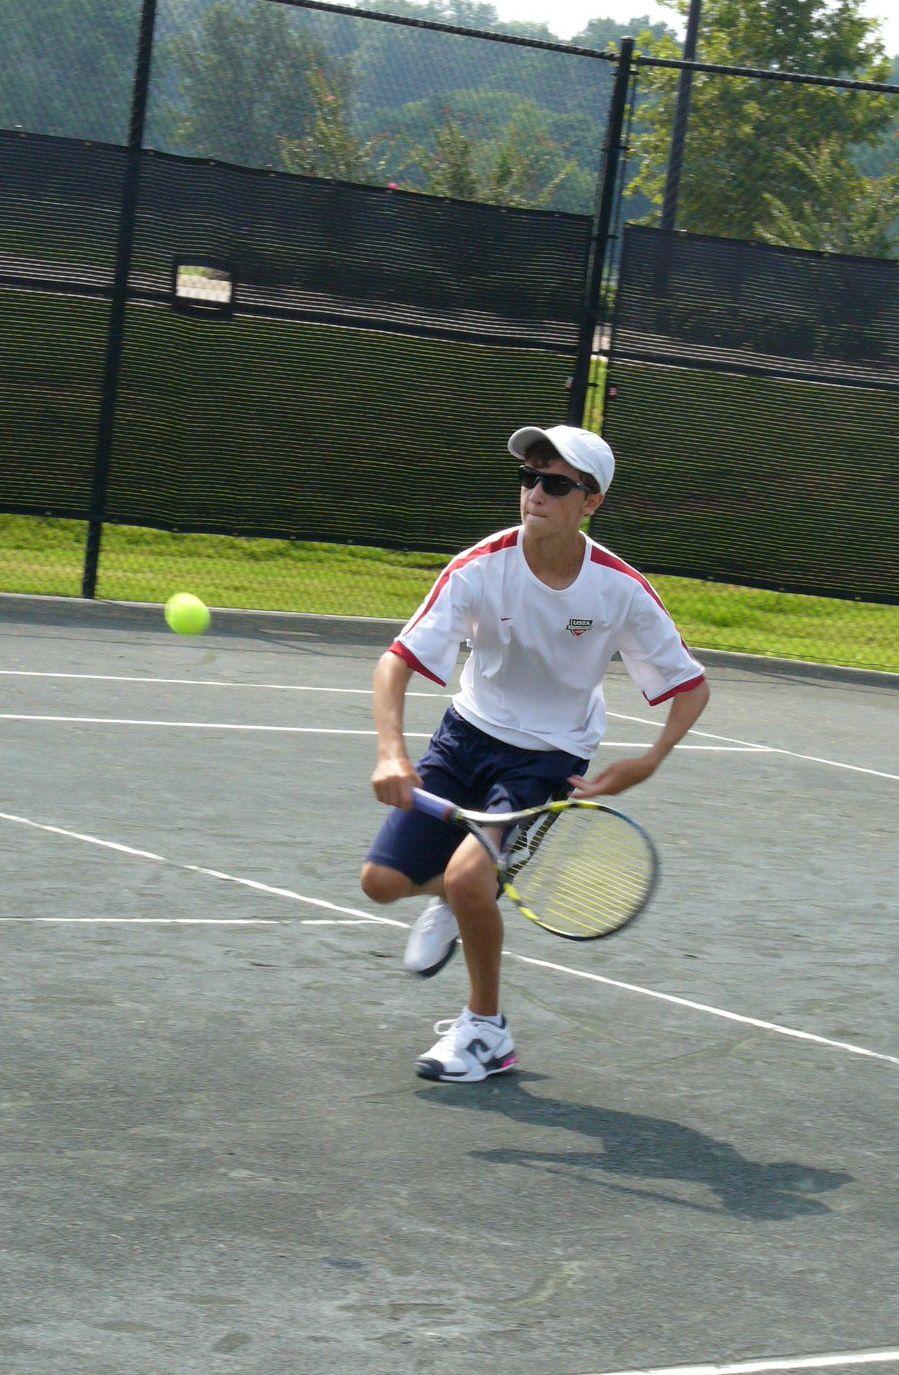 JR Team Tennis - C. W.